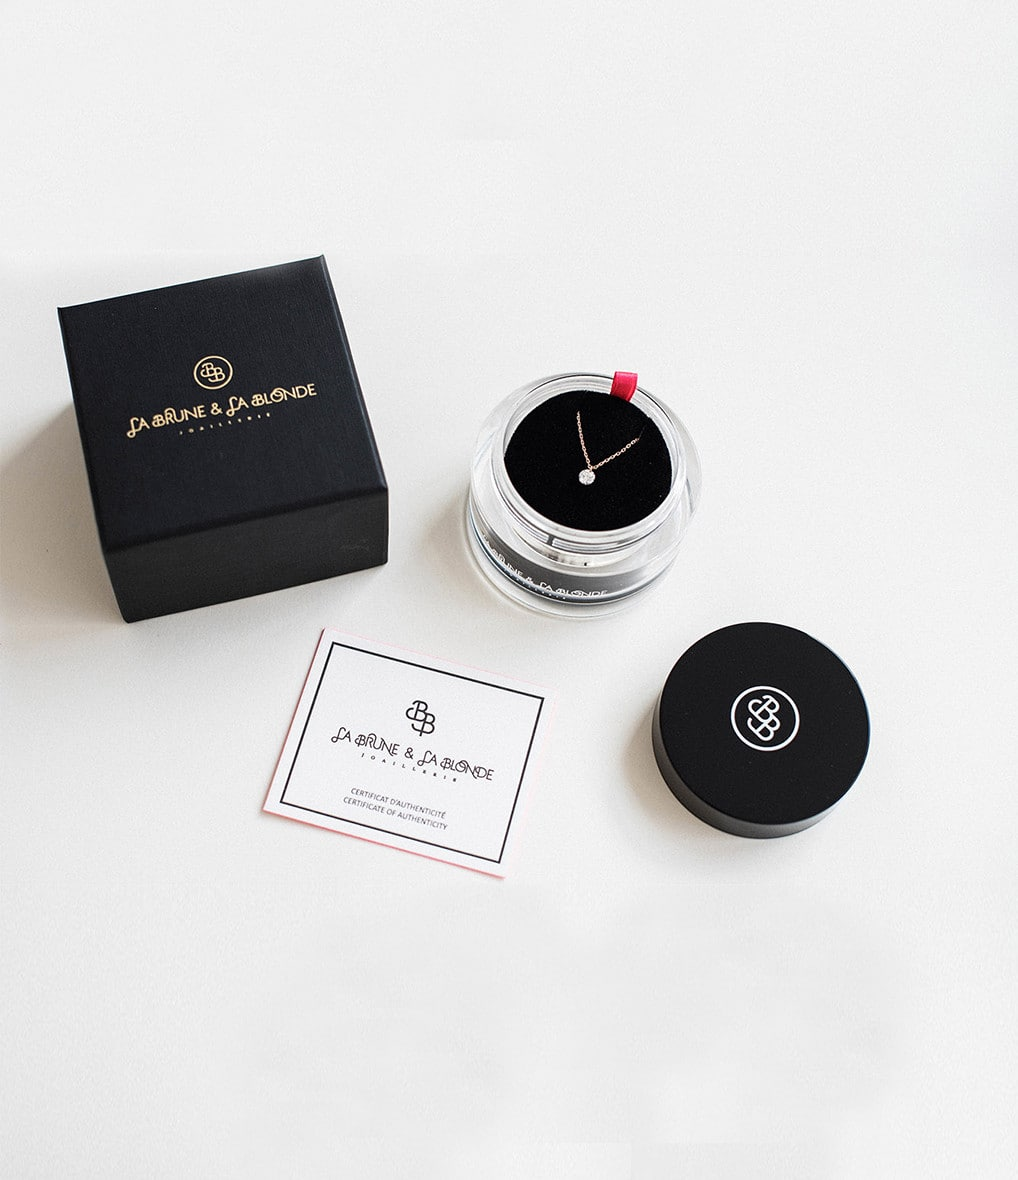 LA BRUNE & LA BLONDE - Bracelet BB Diamant Brillant Cordon Nude Or Rose